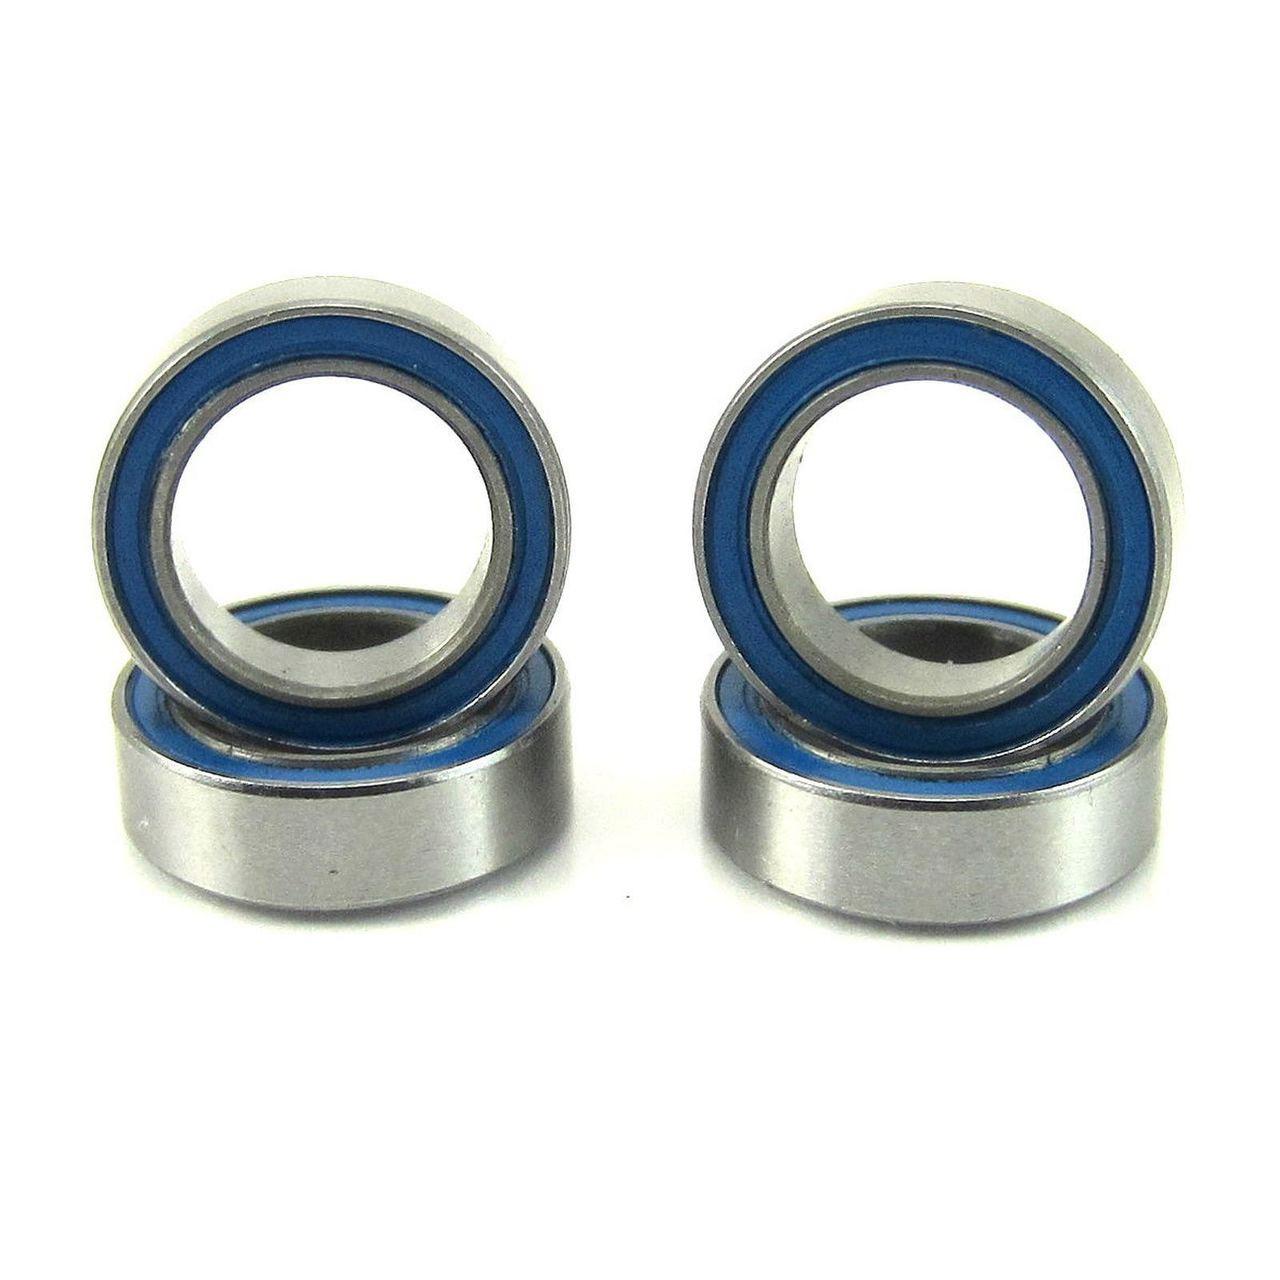 TRB RC 8x12x3.5mm Precision Ball Bearings ABEC 3 BLU Rubber Sealed (4)